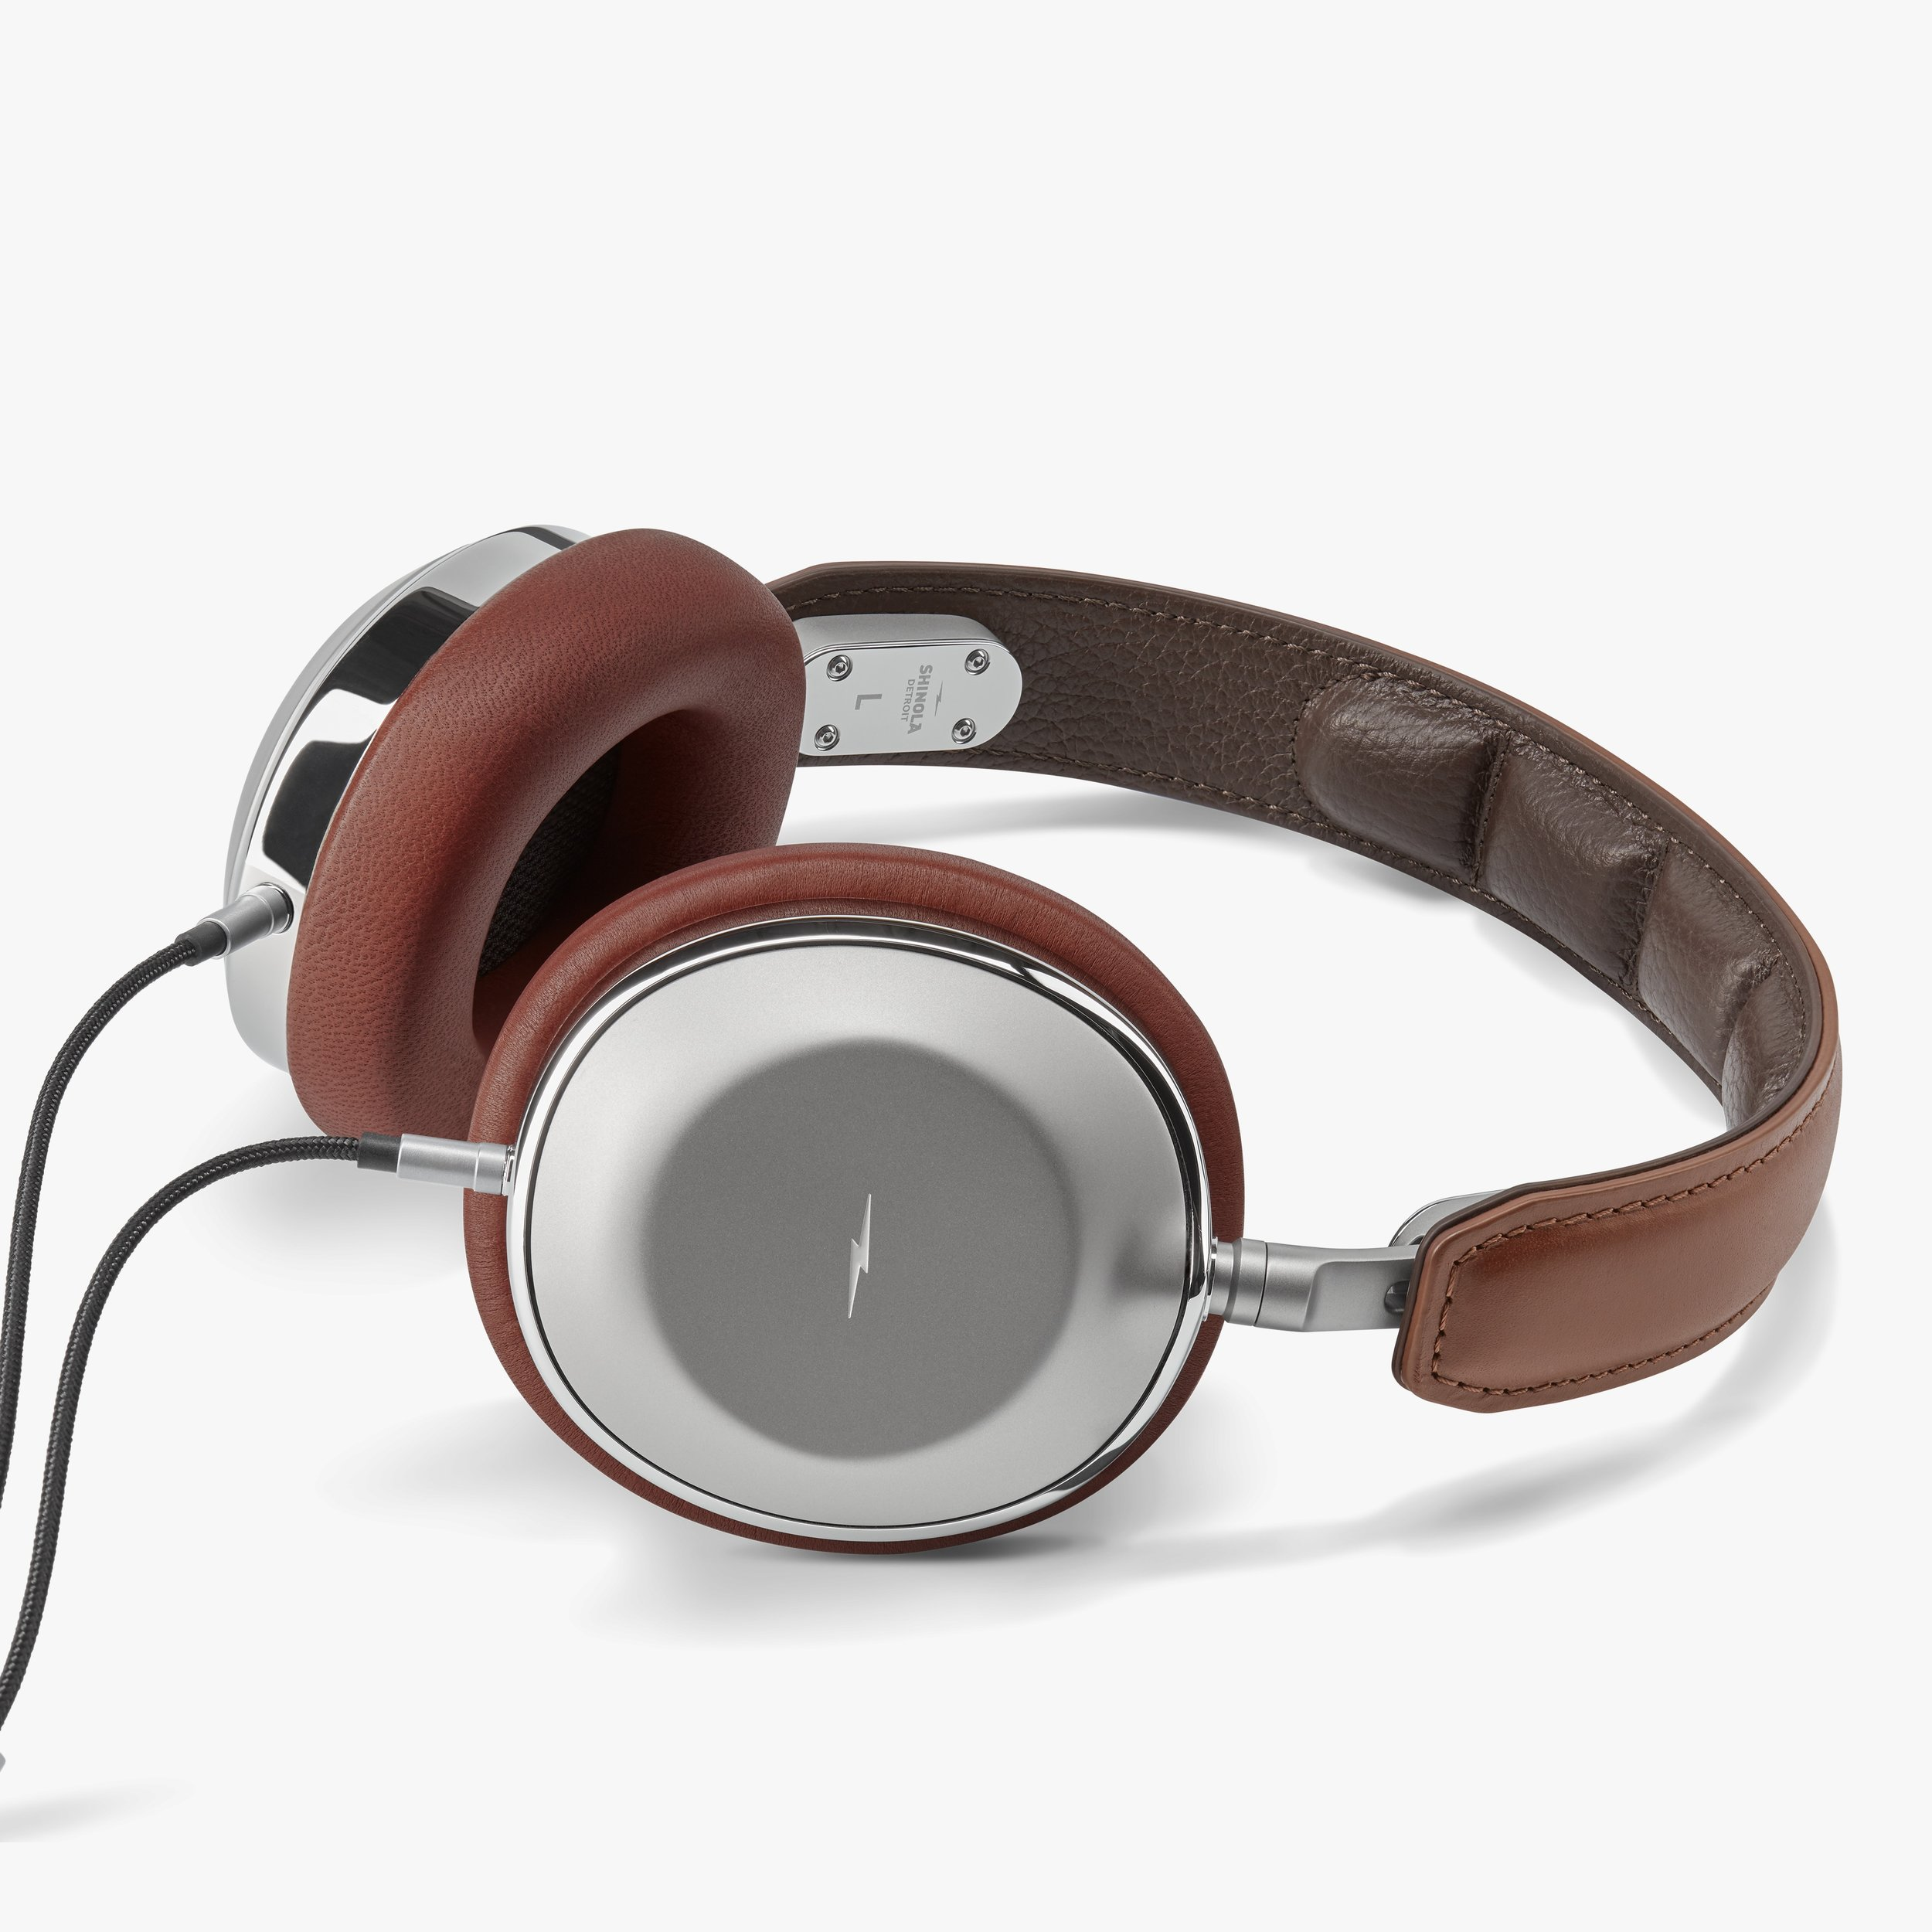 s4220080929_headphones_overear_cognac_silver_v3_3840h.jpeg